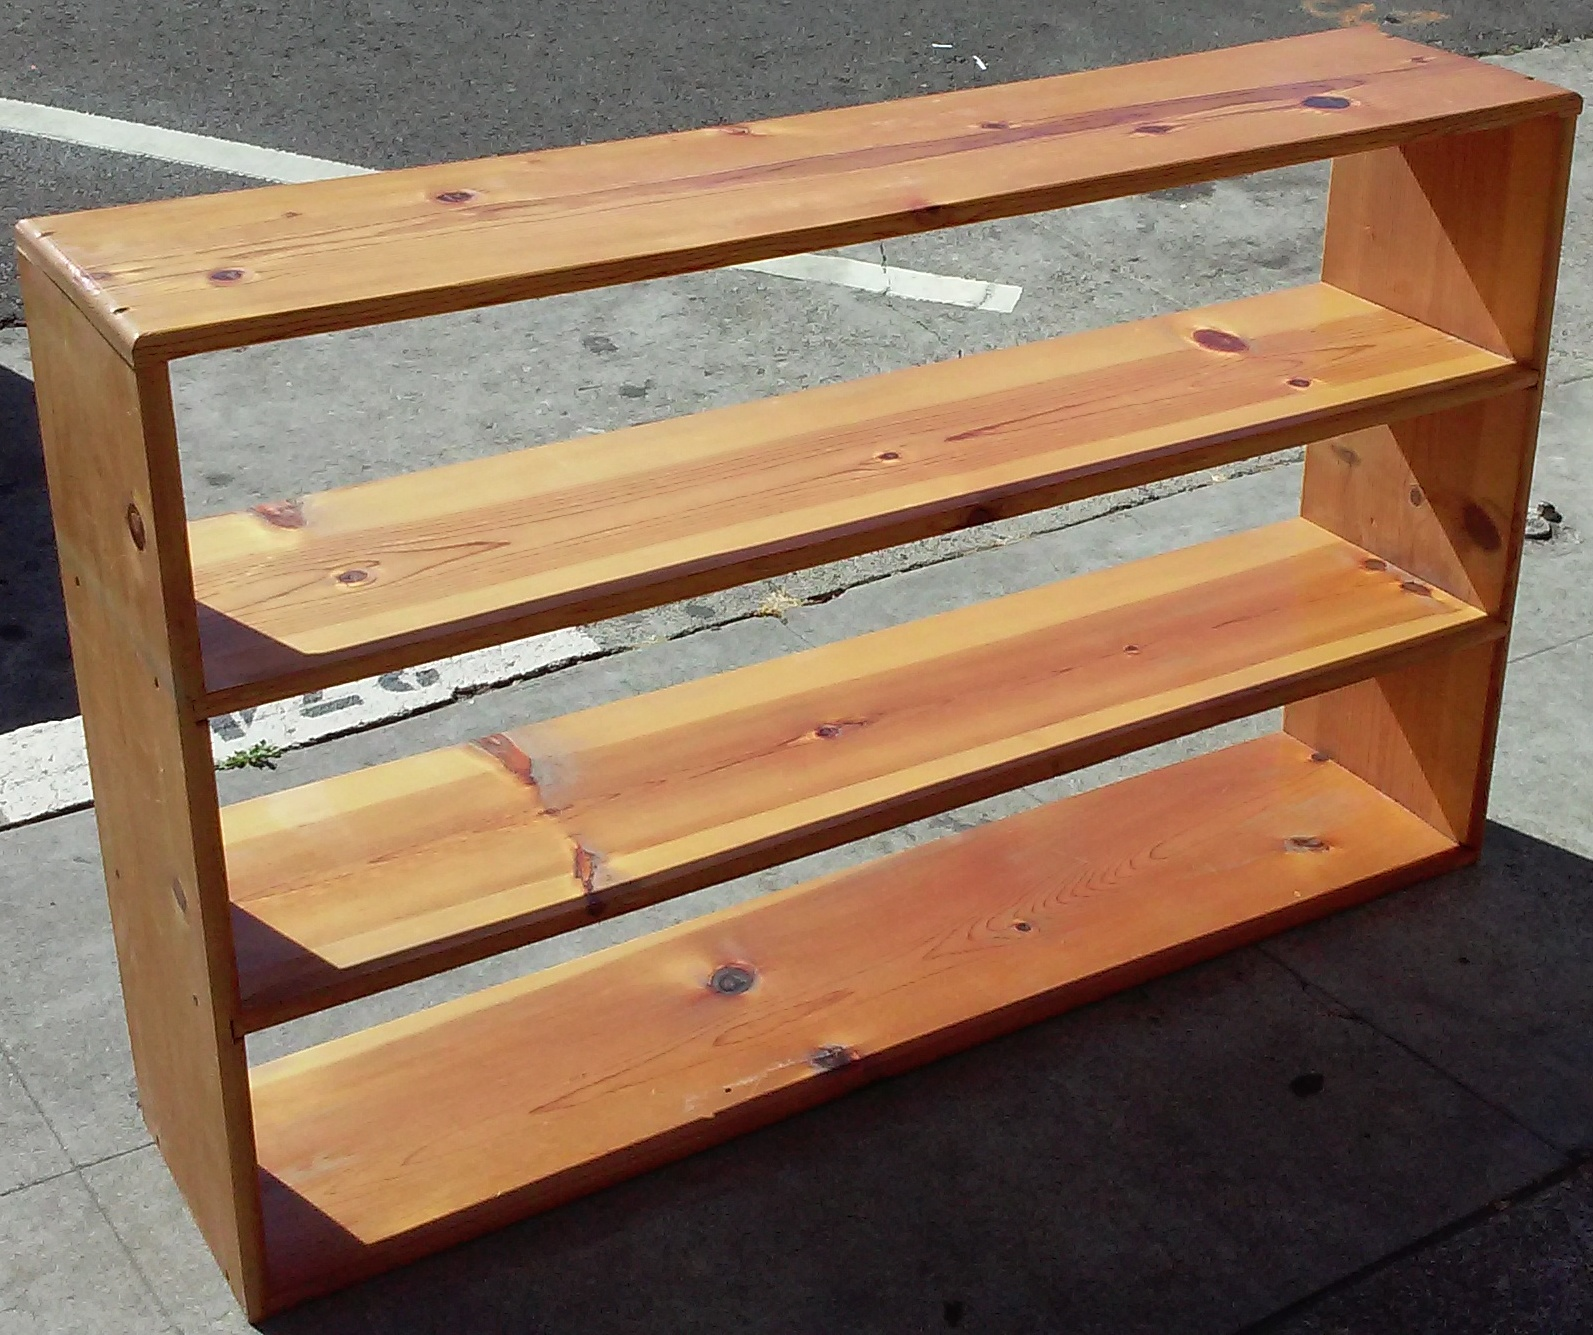 Uhuru Furniture Collectibles Sold 4 39 X 2 1 2 39 Knotty Pine Shelf 35